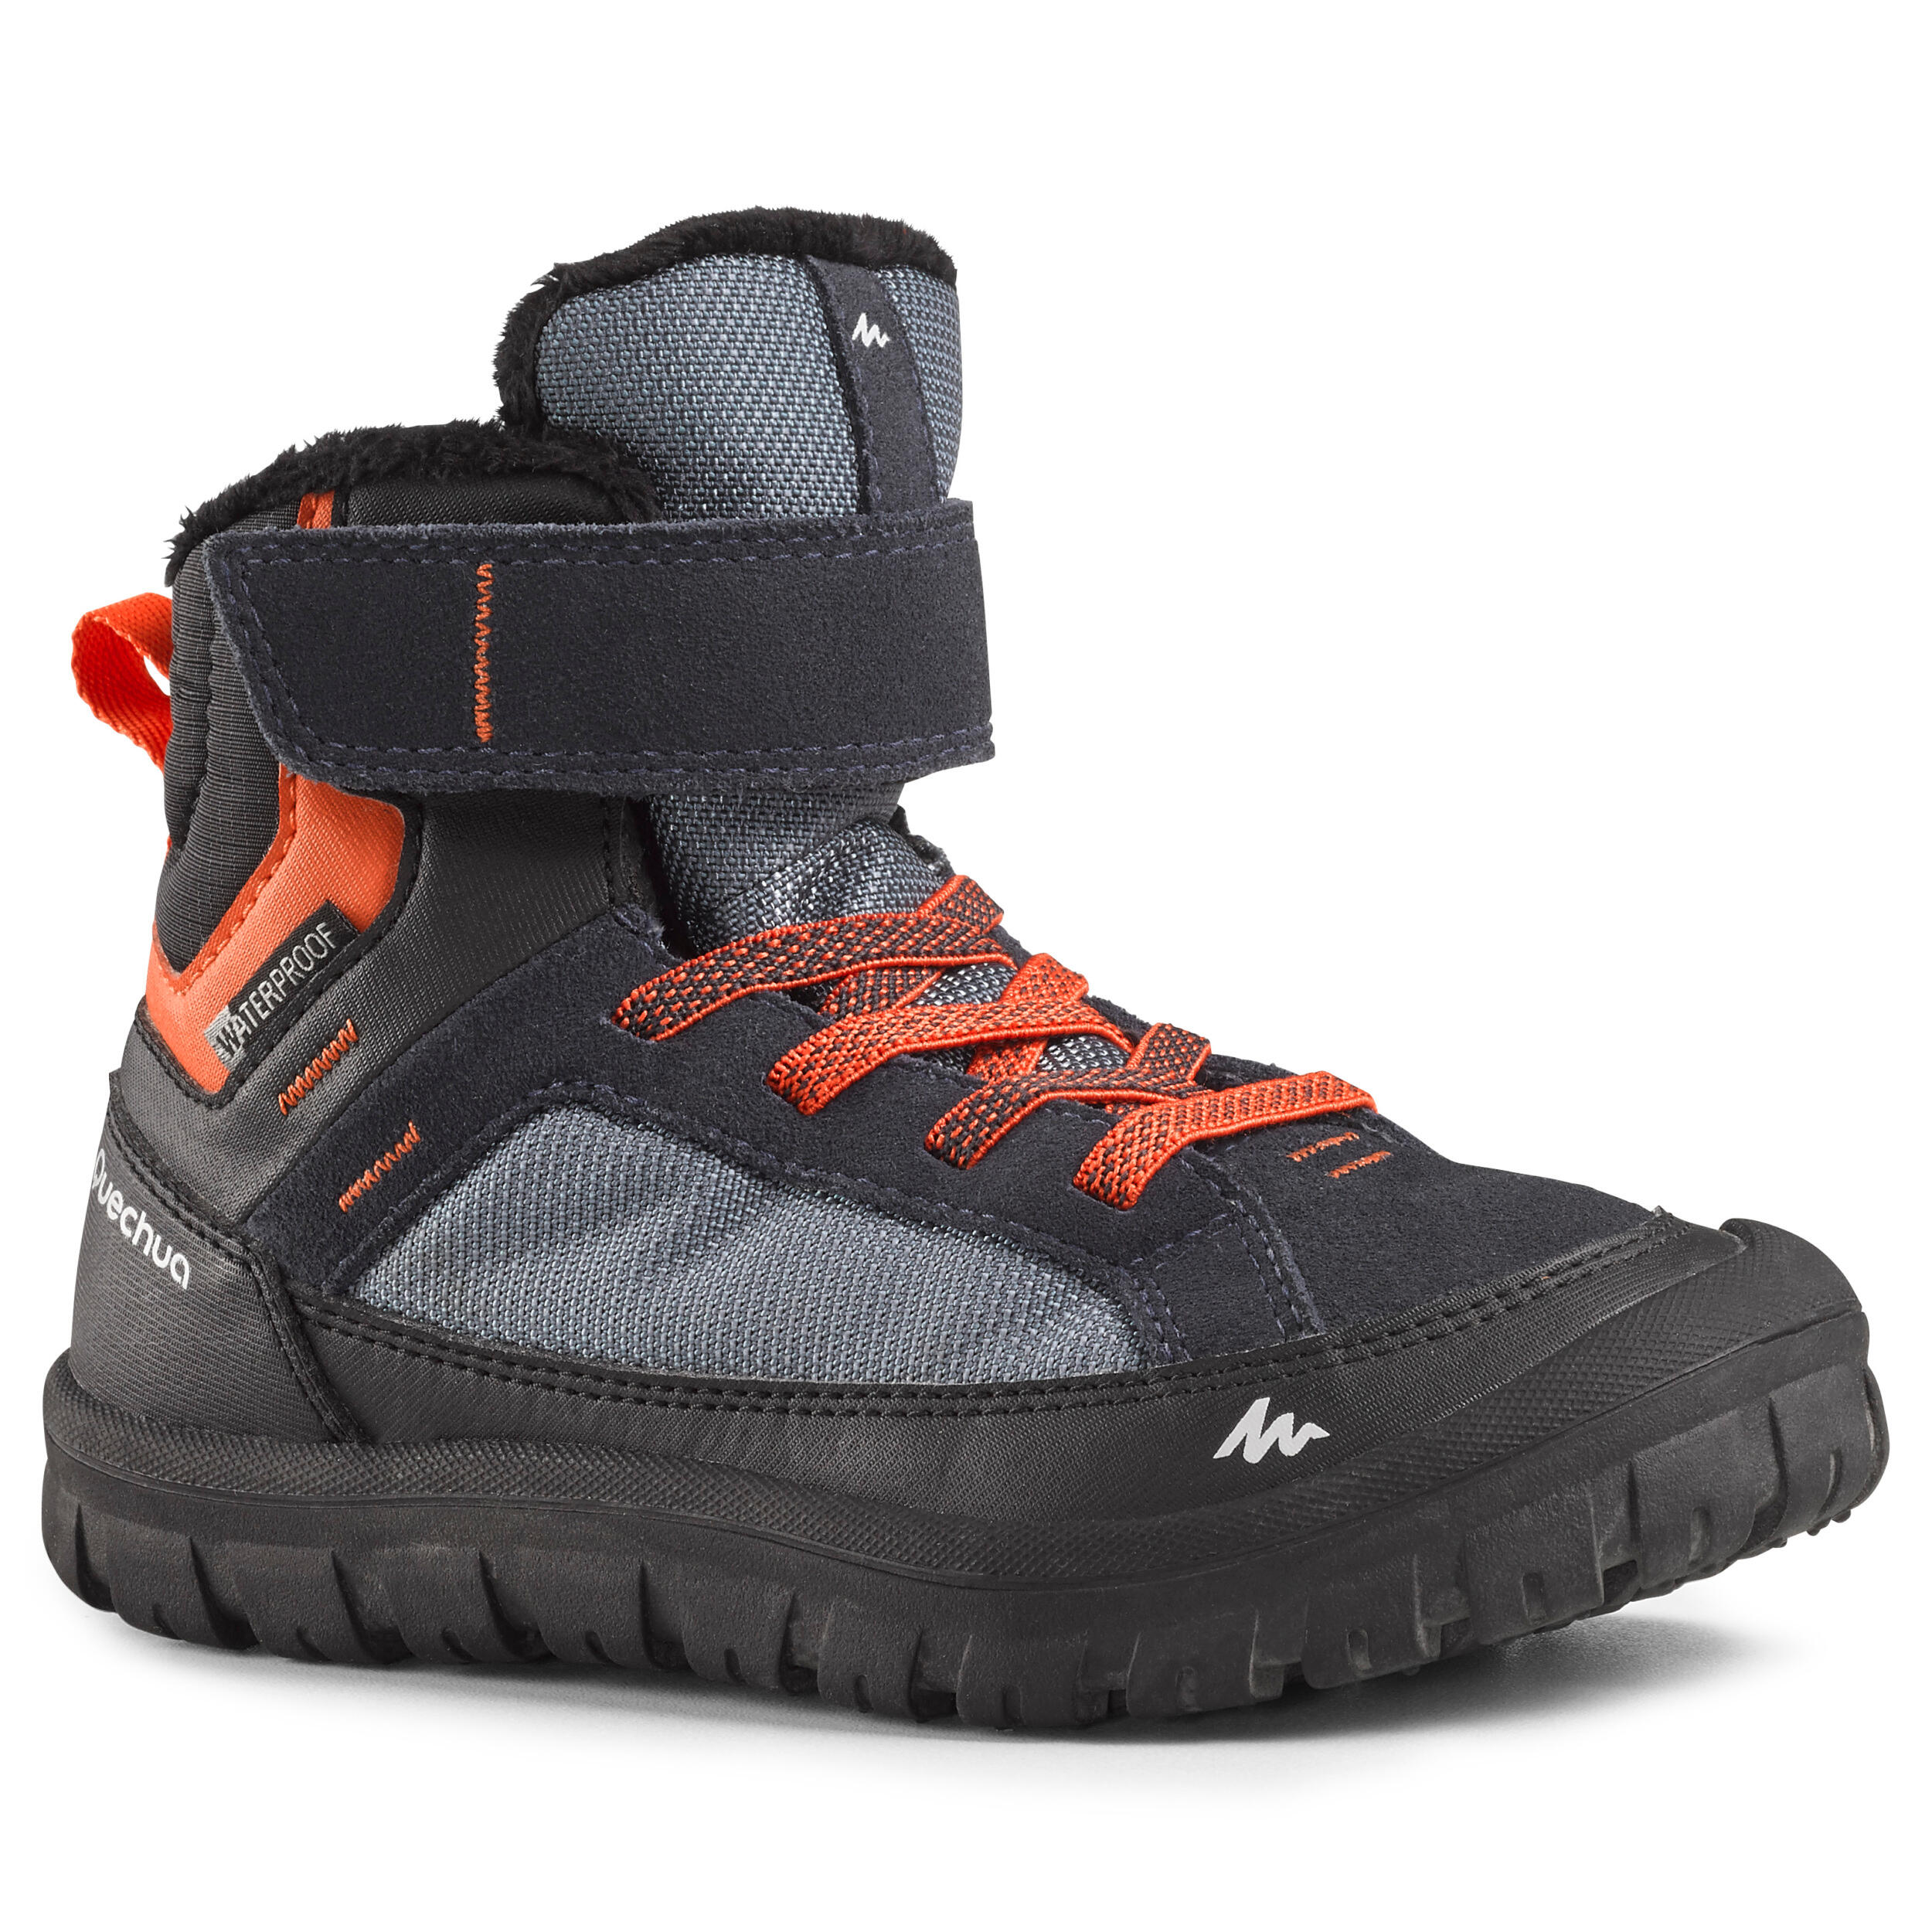 82a6b16edbe Children s Snow Hiking Shoes SH500 Warm Junior Rip-Tab Mid Snow Hiking Boots  - Blue - Decathlon